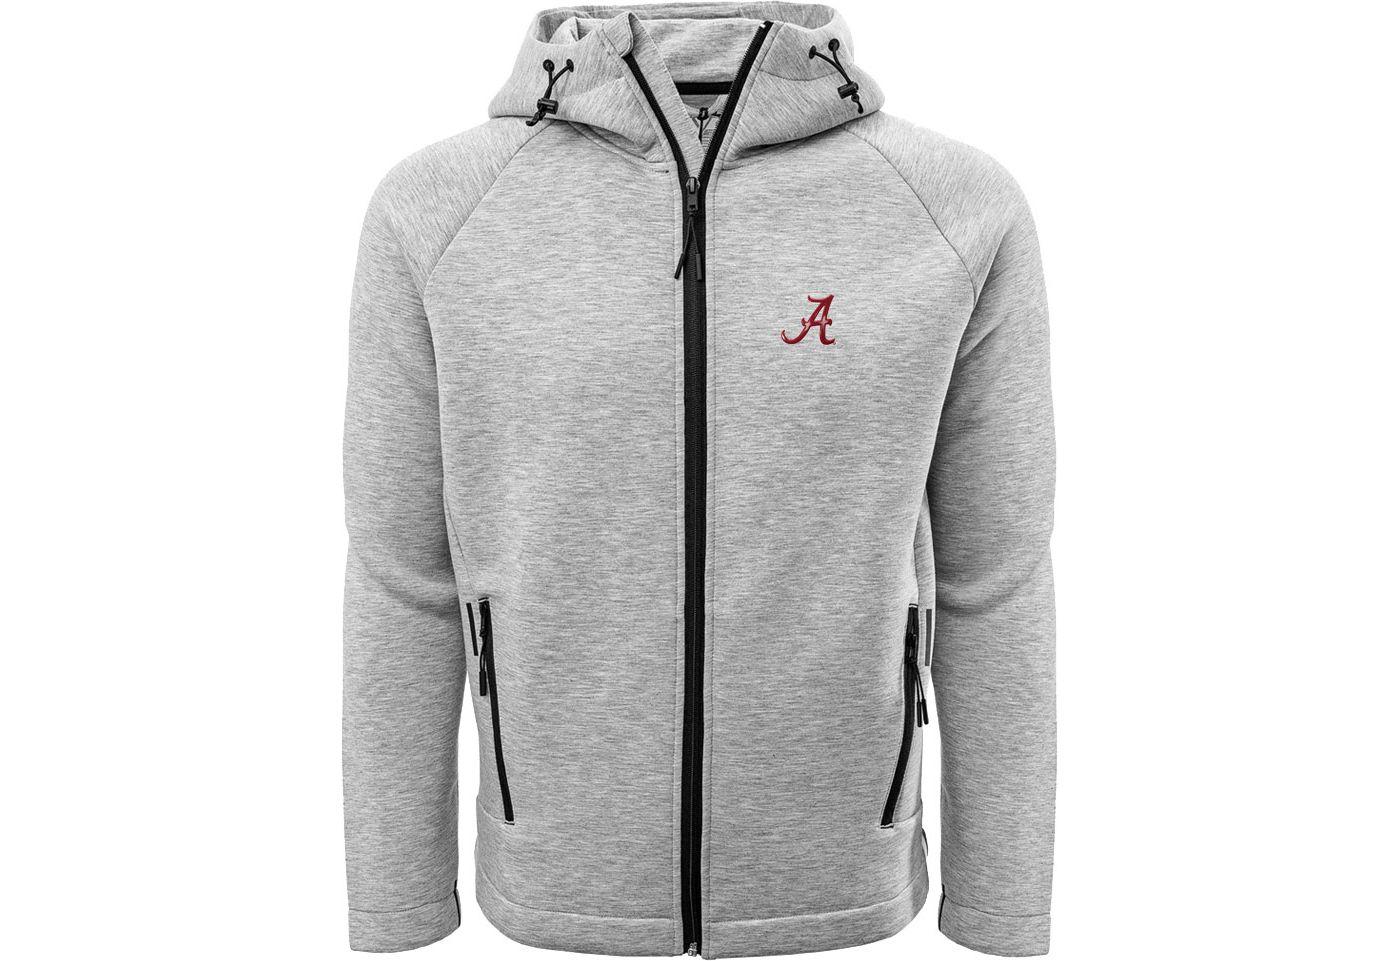 Levelwear Men's Alabama Crimson Tide Grey Titan Full-Zip Jacket